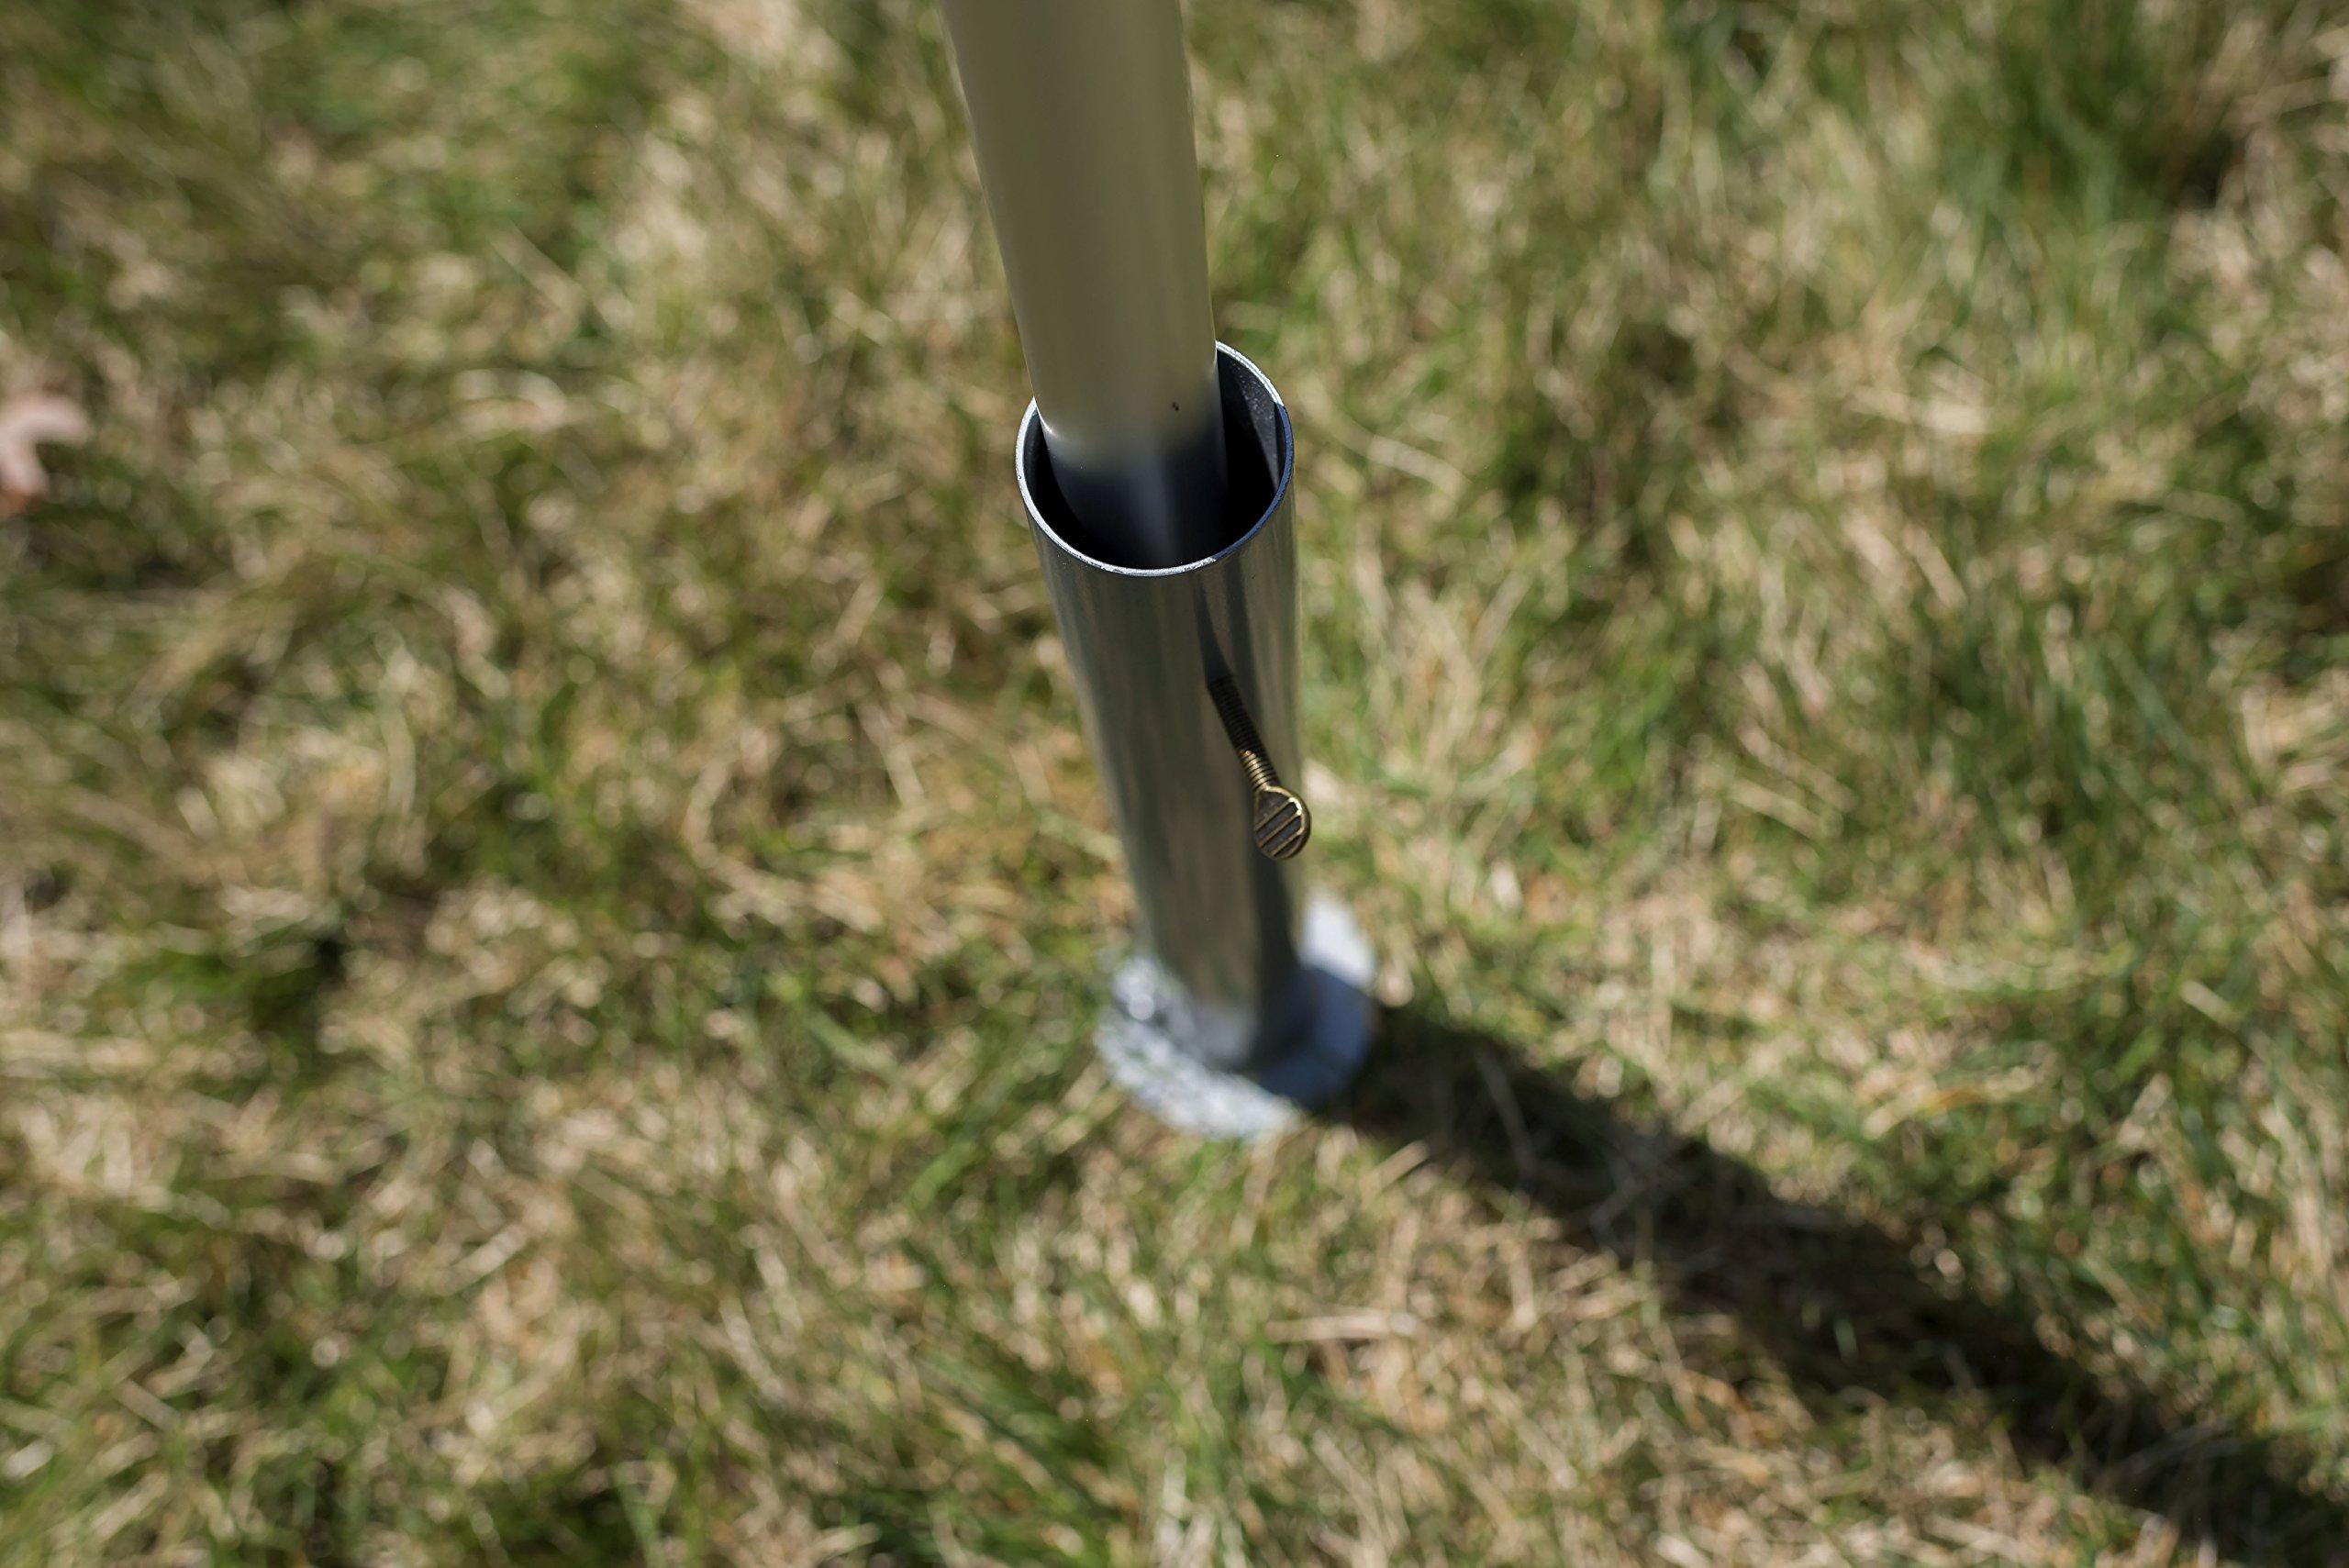 Flagpole-To-Go Ground Mount for Portable Flagpole